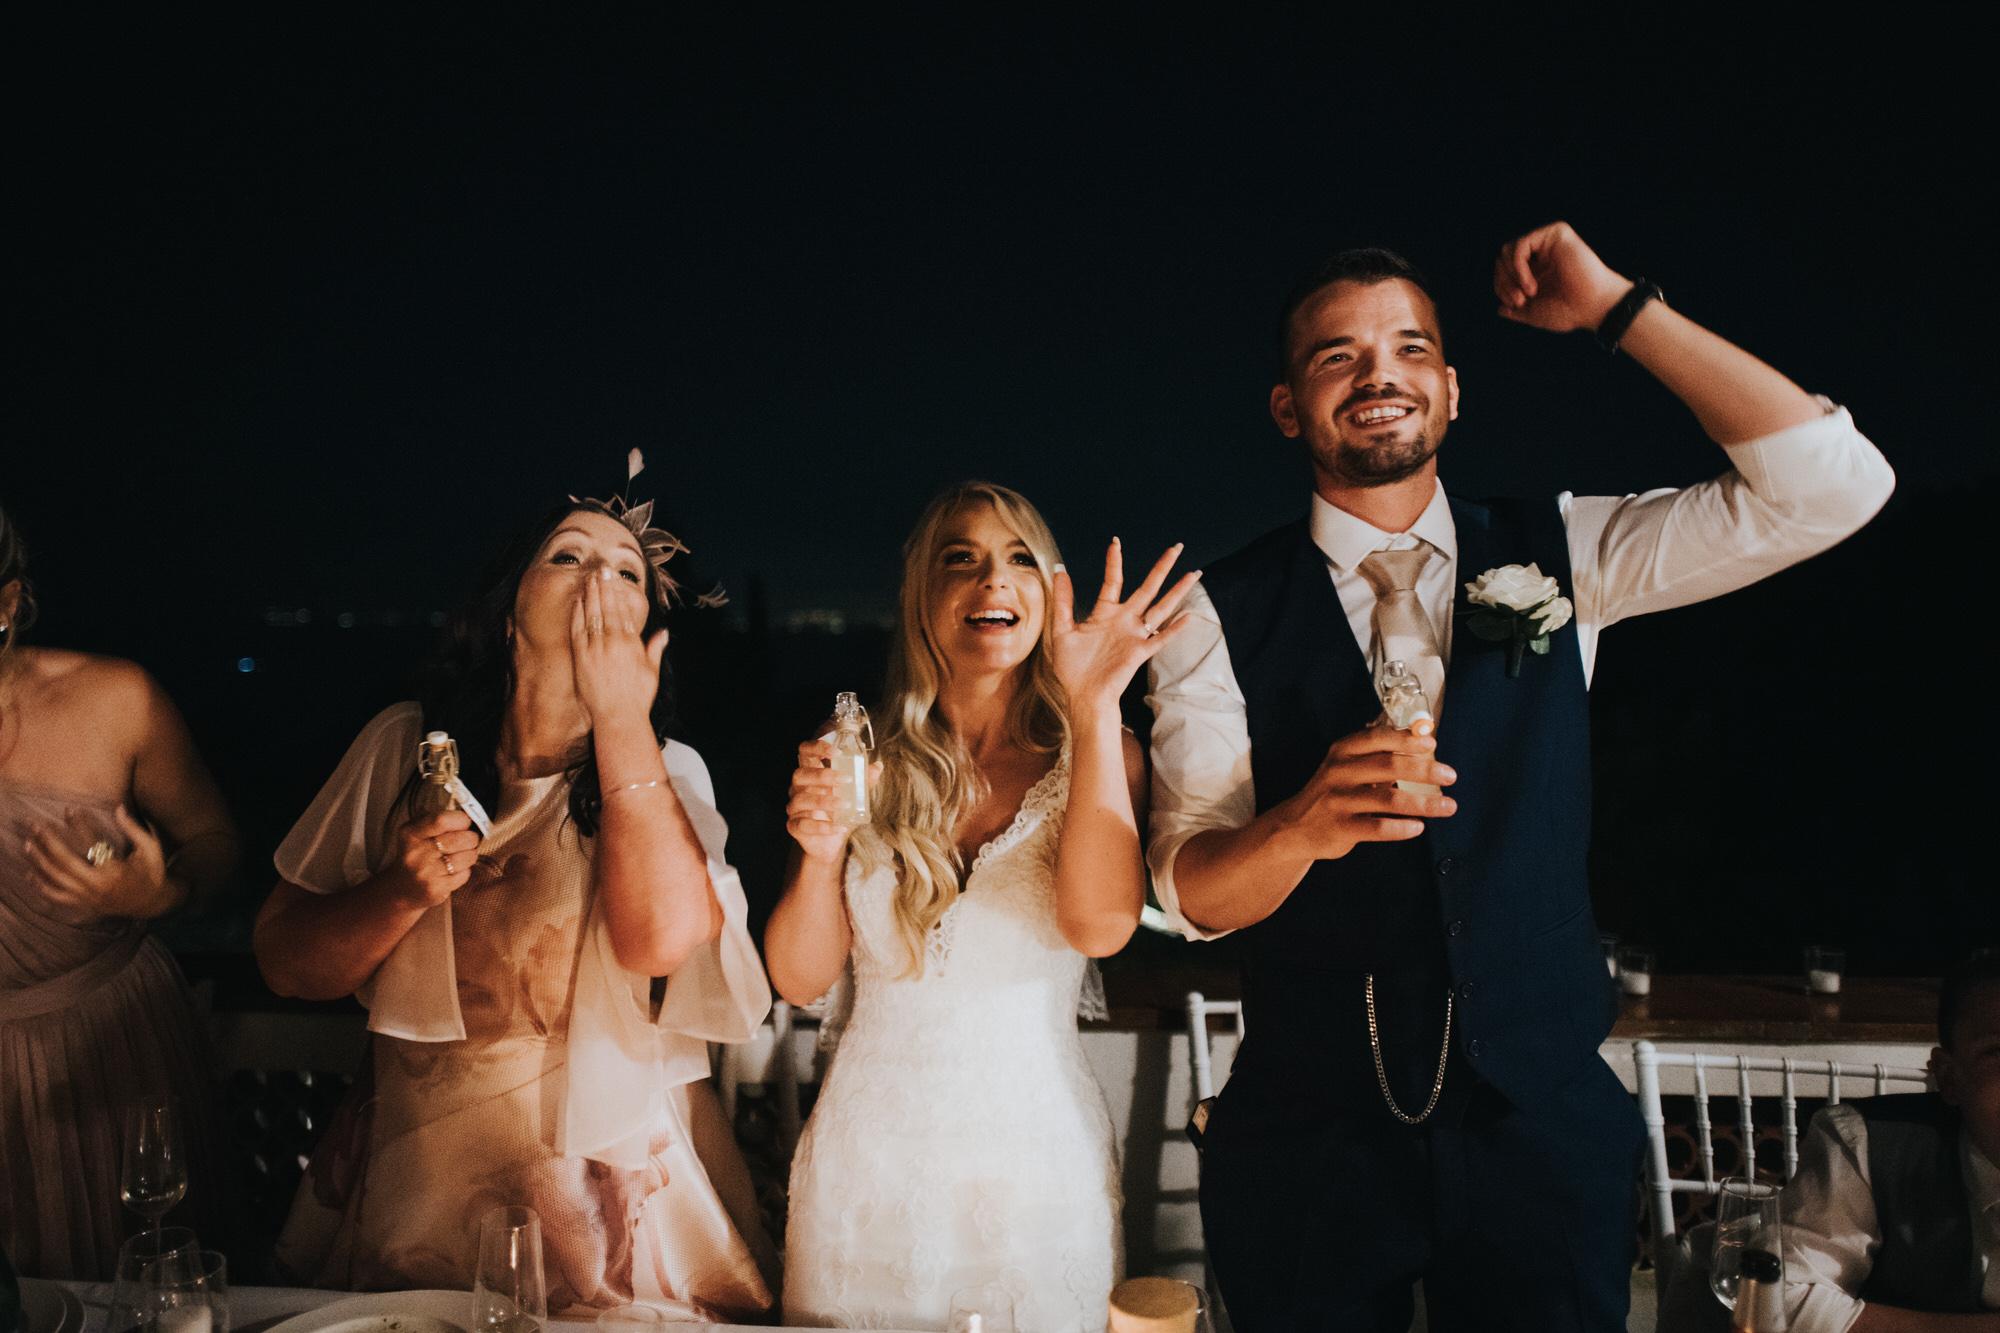 Sorrento wedding photographer 62